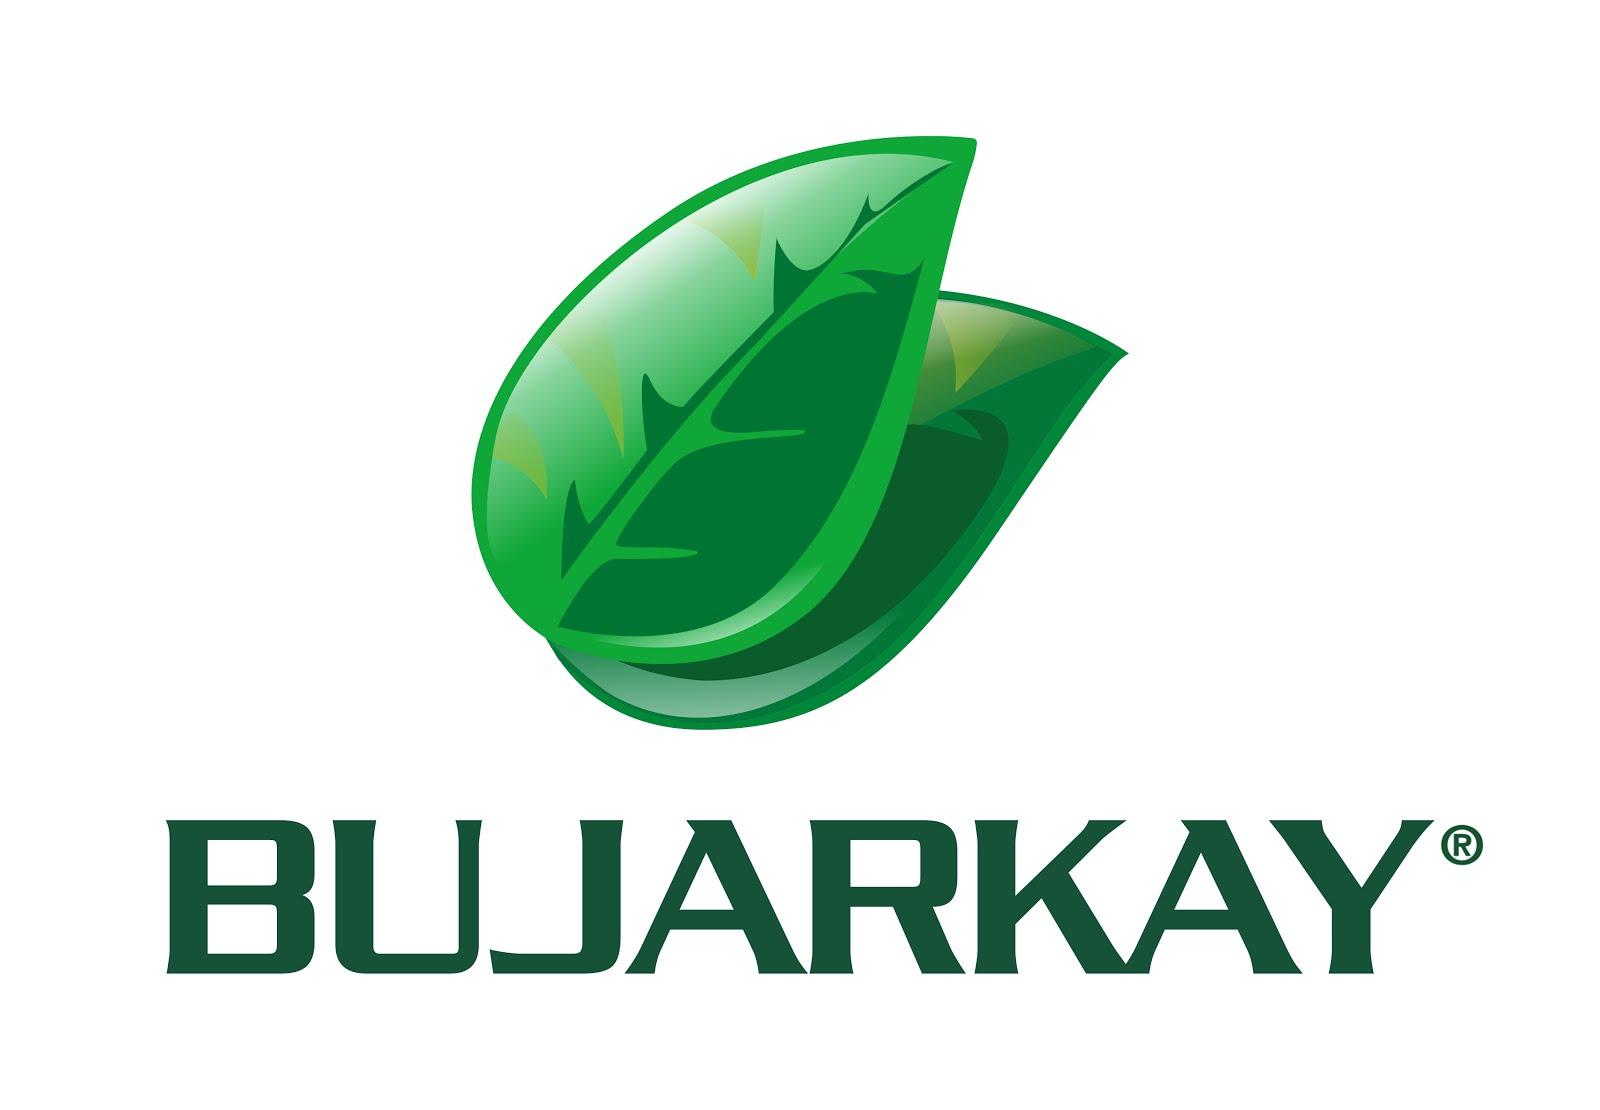 Bujarkay